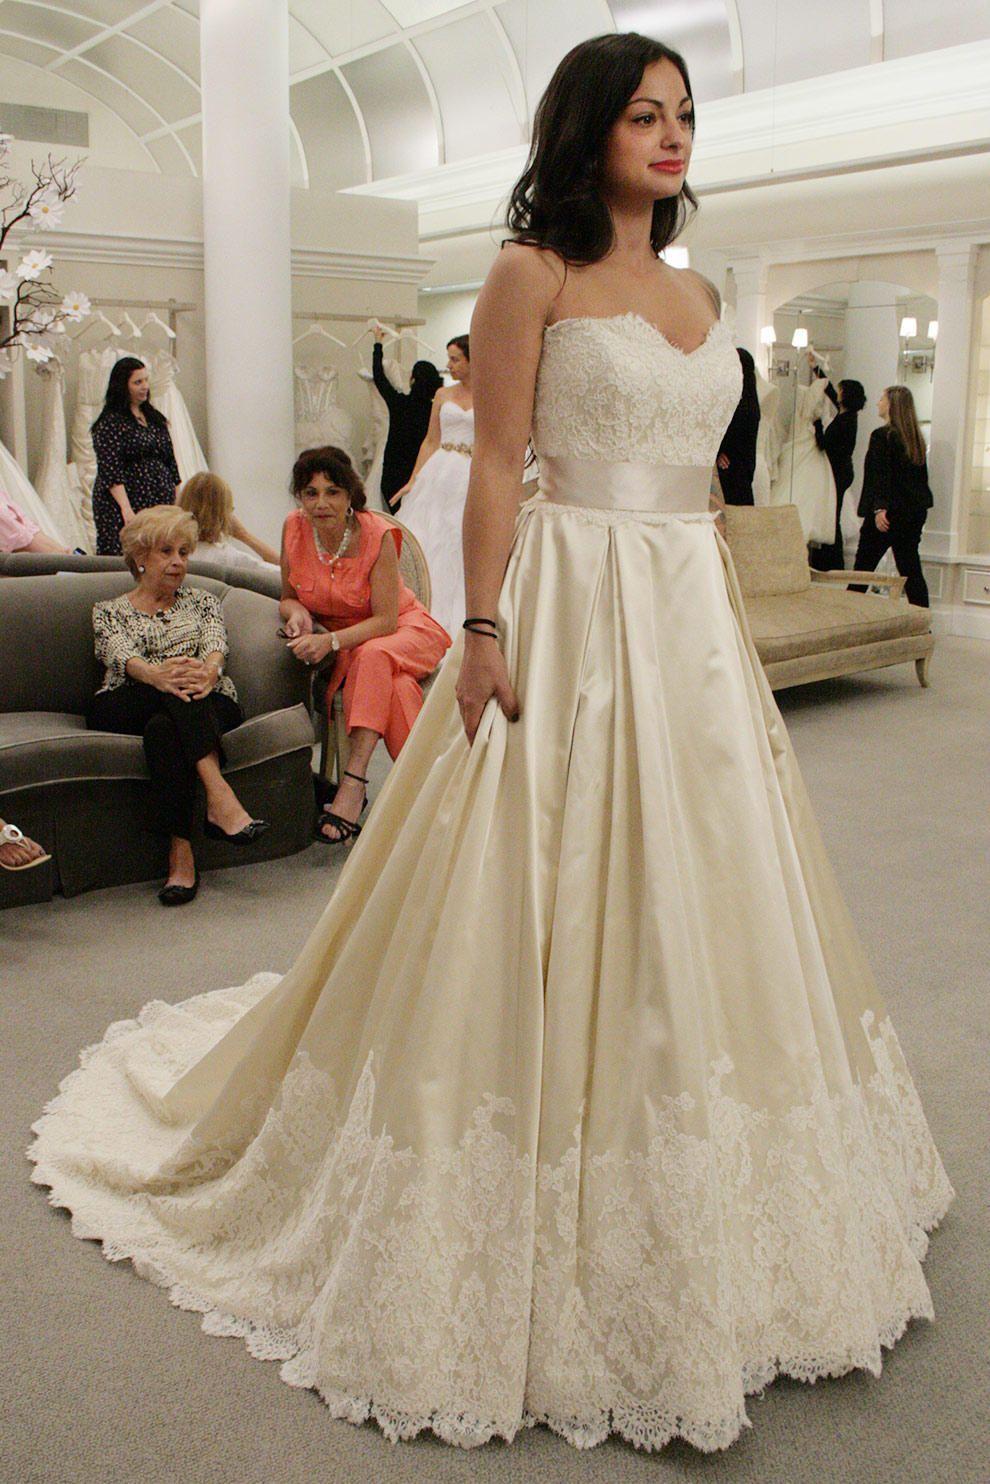 Season 11 Featured Wedding Dresses, Part 3 | Pinterest | White ...